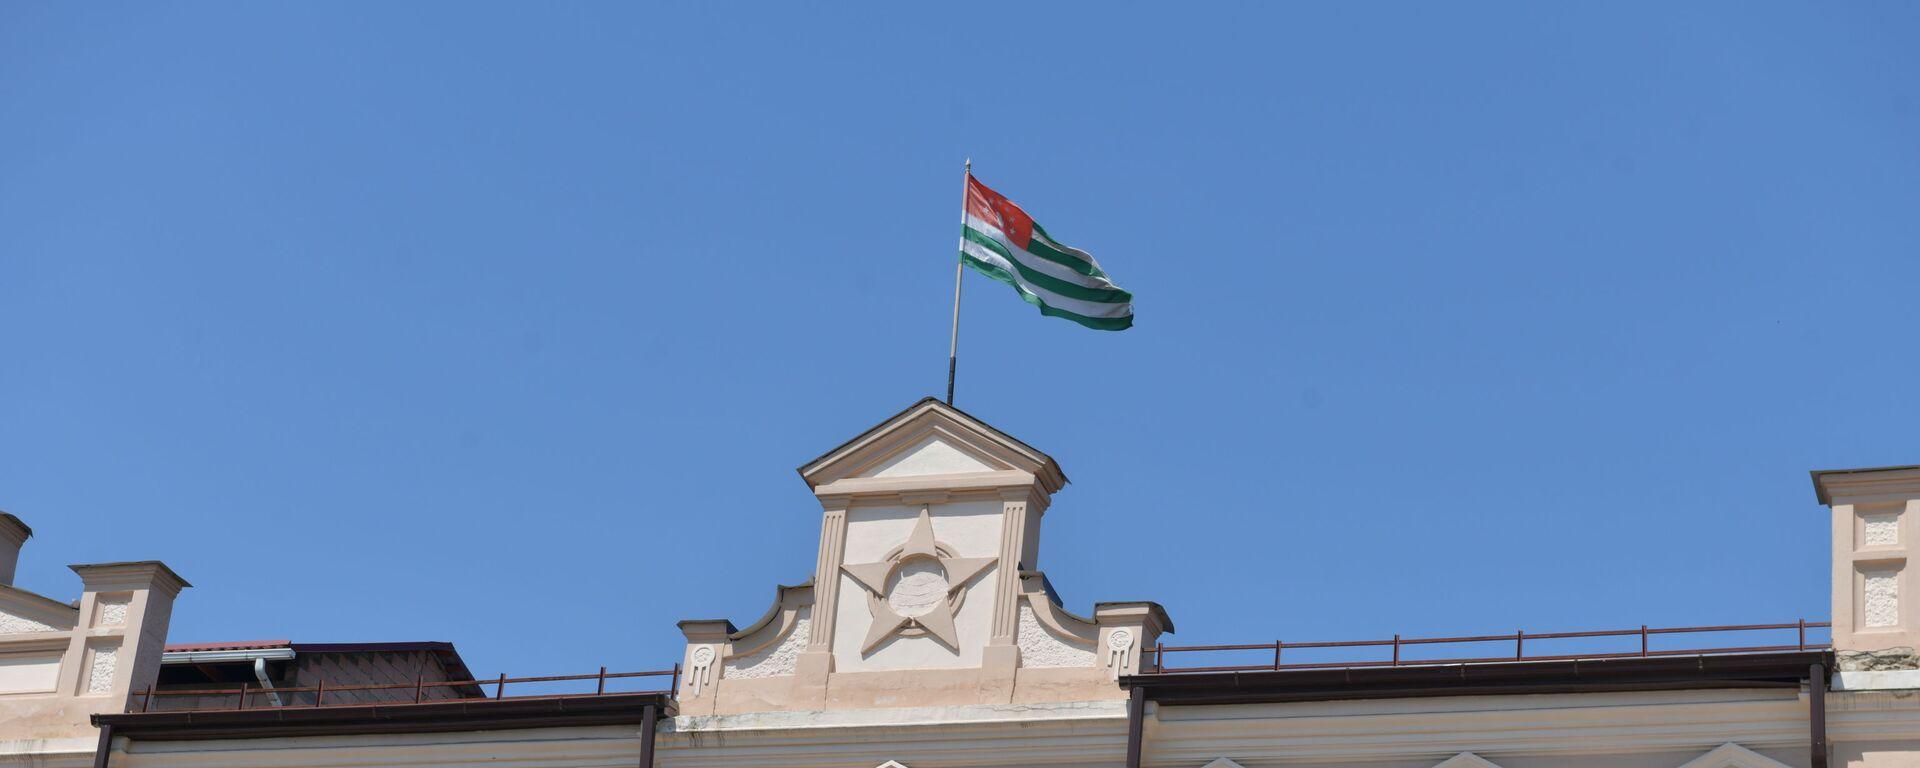 Верховный суд Абхазии  - Sputnik Абхазия, 1920, 12.10.2021